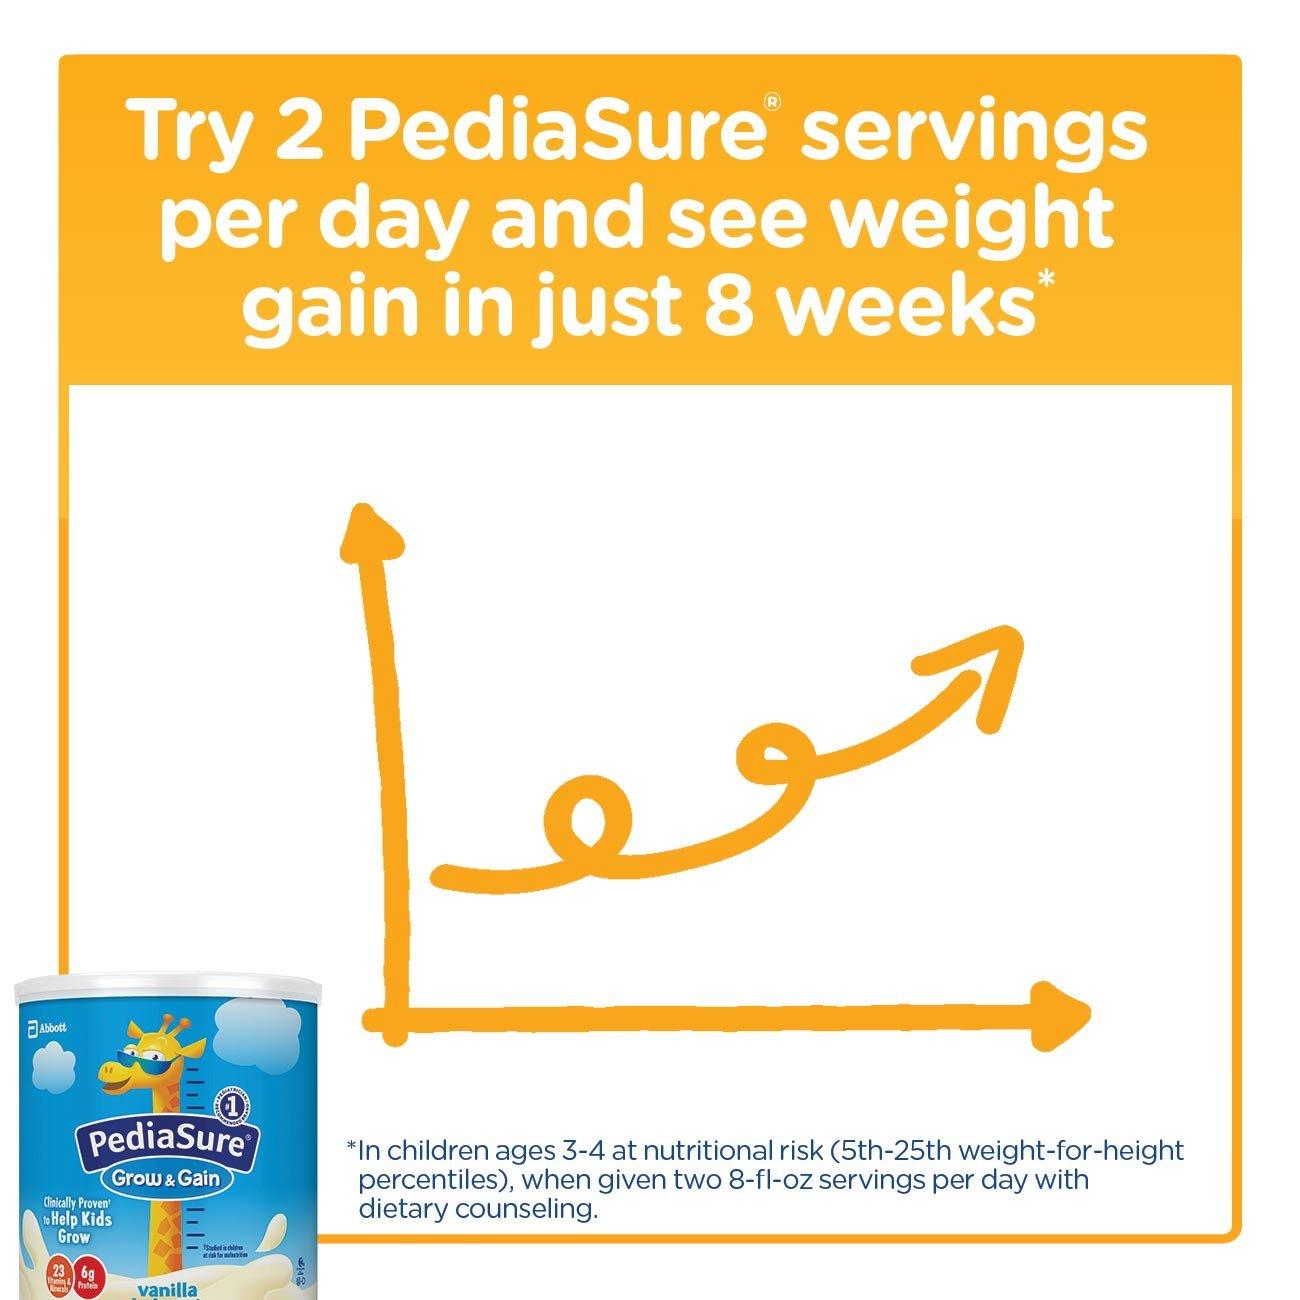 PediaSure Grow & Gain Non-GMO Vanilla Shake Mix Powder, Nutrition Shake for Kids, 14.1 oz, 3 Count by Pediasure (Image #4)